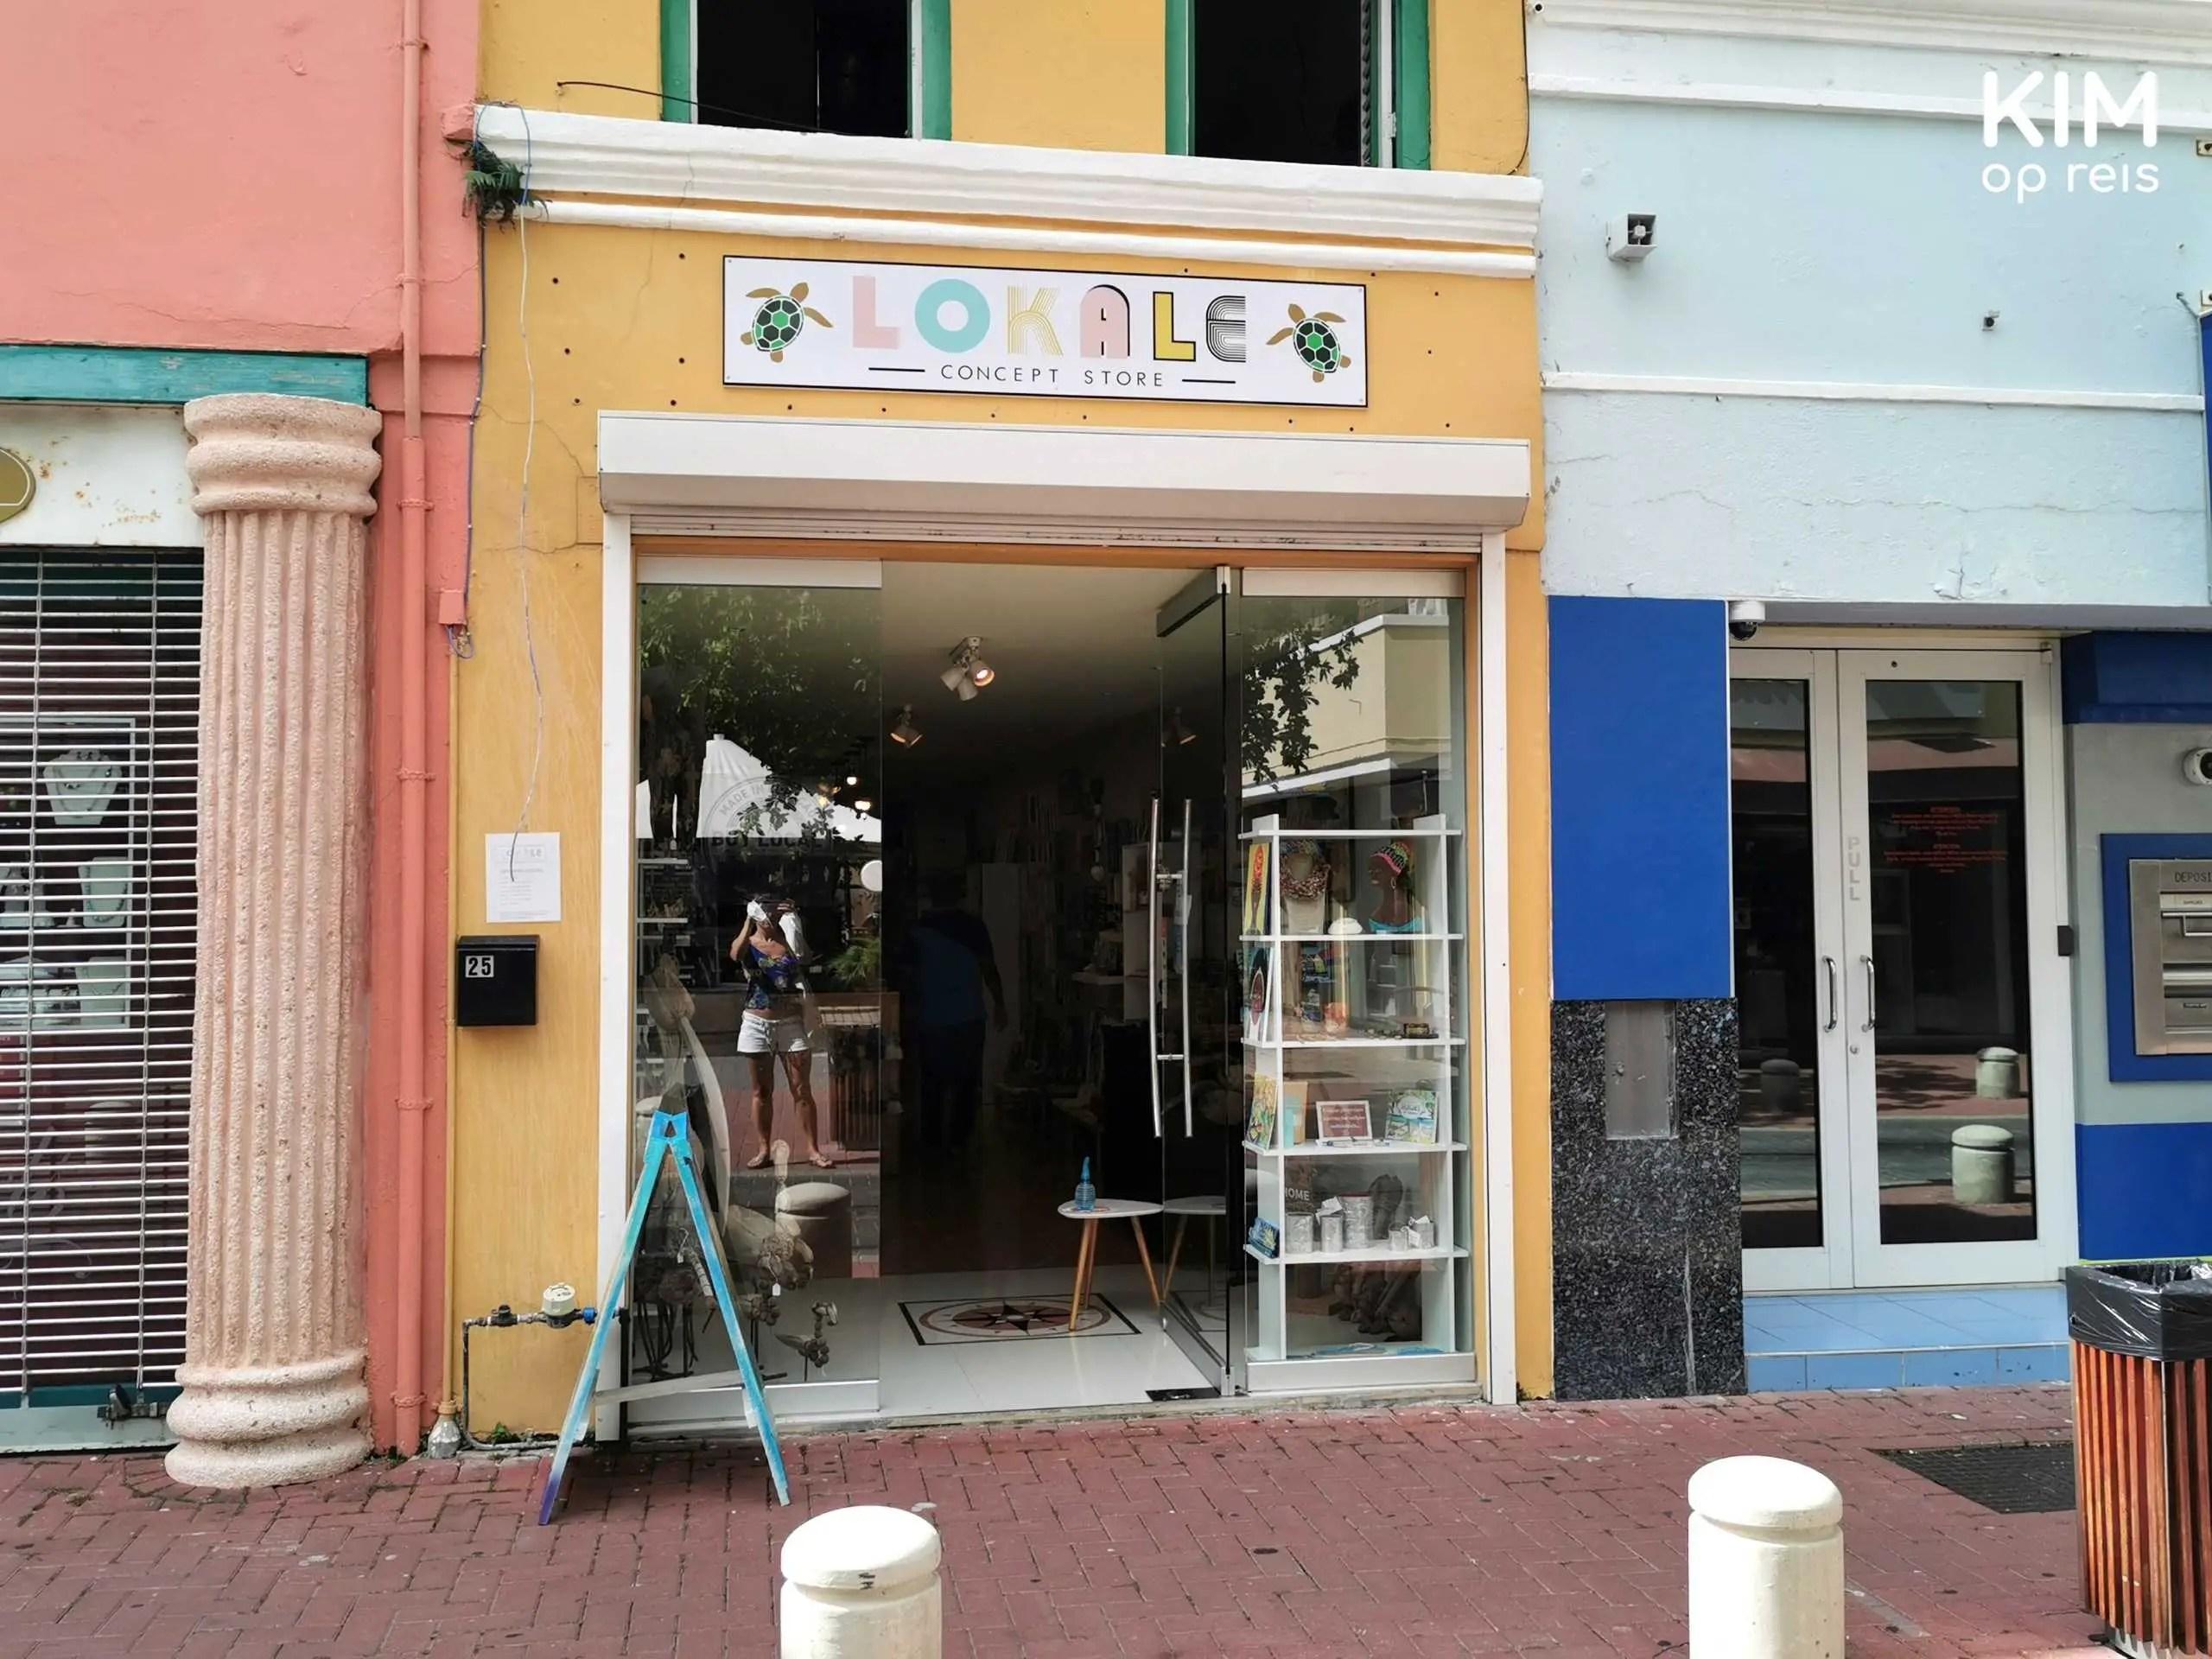 Souvenirs Lokale Concept Store: Ingang winkel